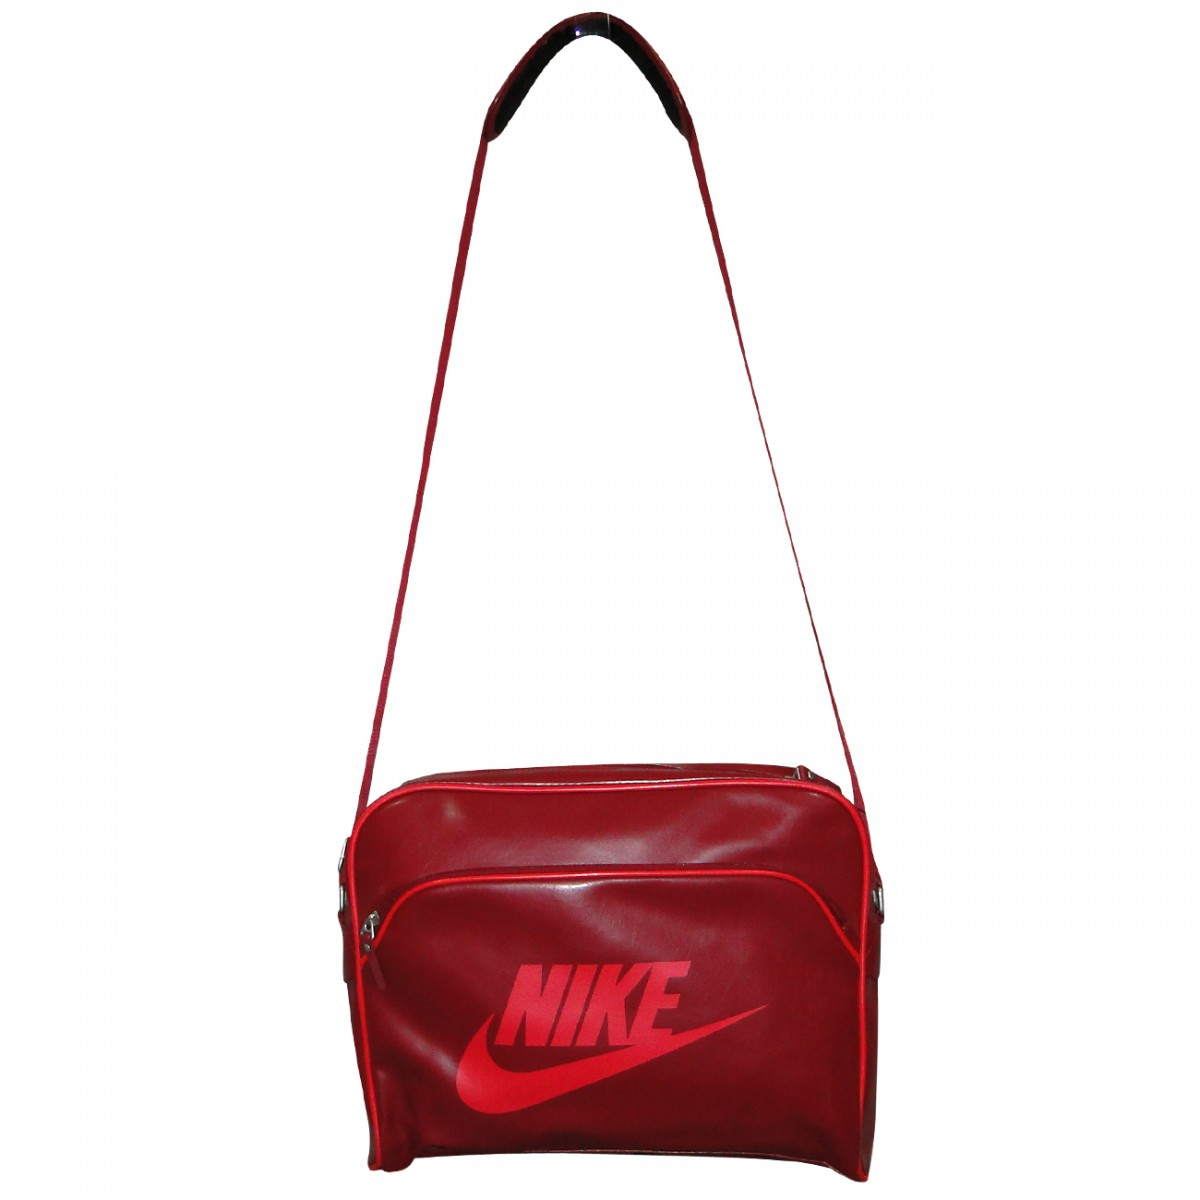 Bolsa De Viagem Da Nike Feminina : Bolsa nike ba  bord? chuteira